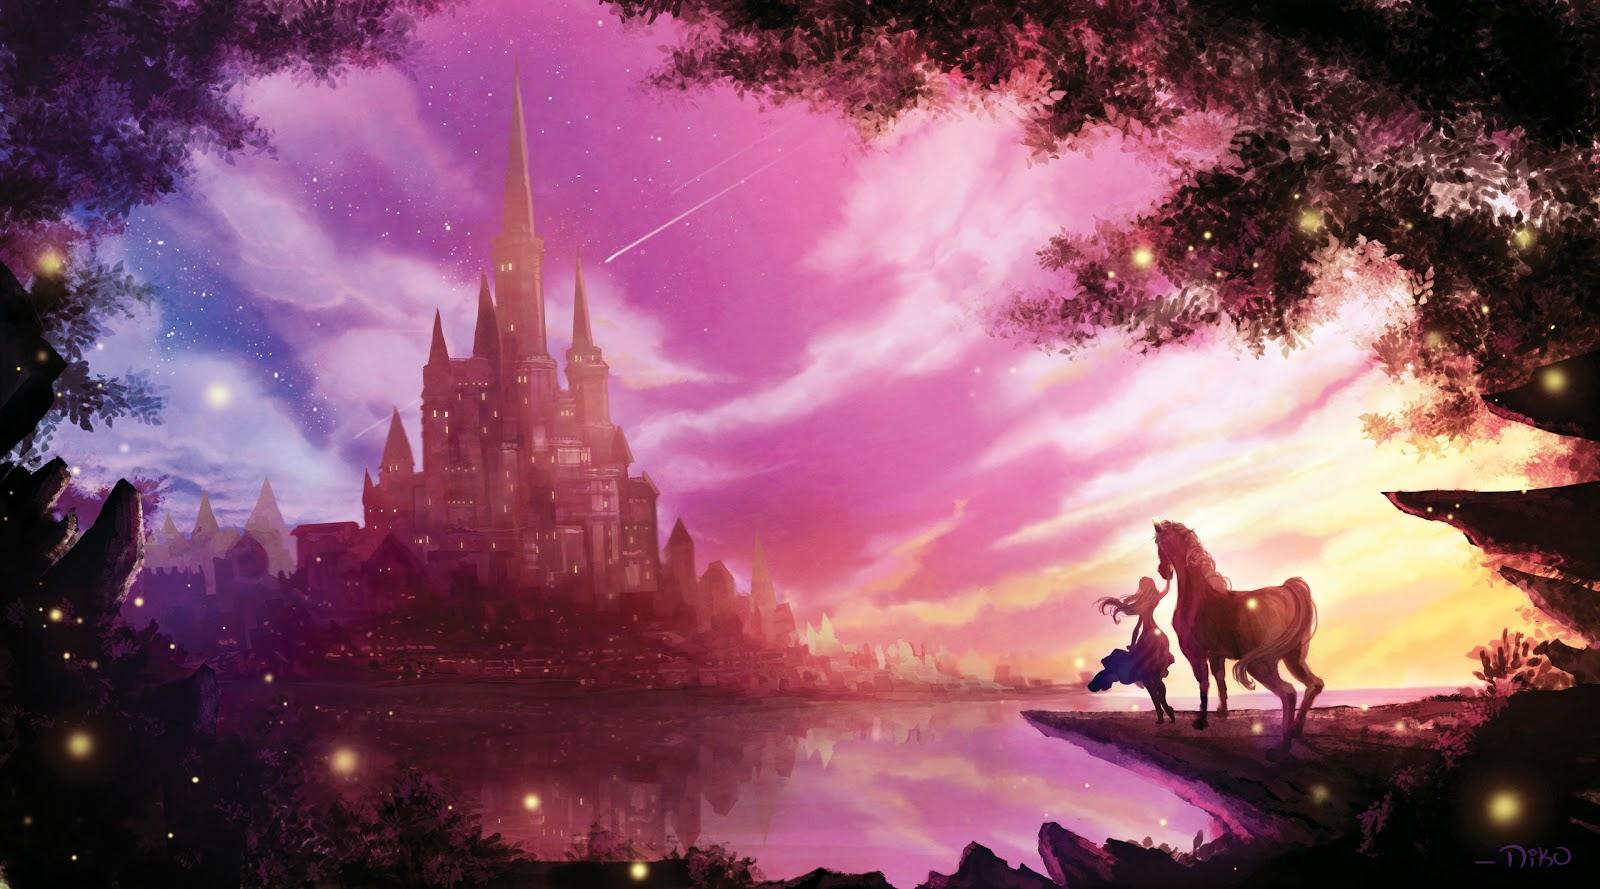 The Art Of Niko Niko Disney Castle Wish Upon A Star